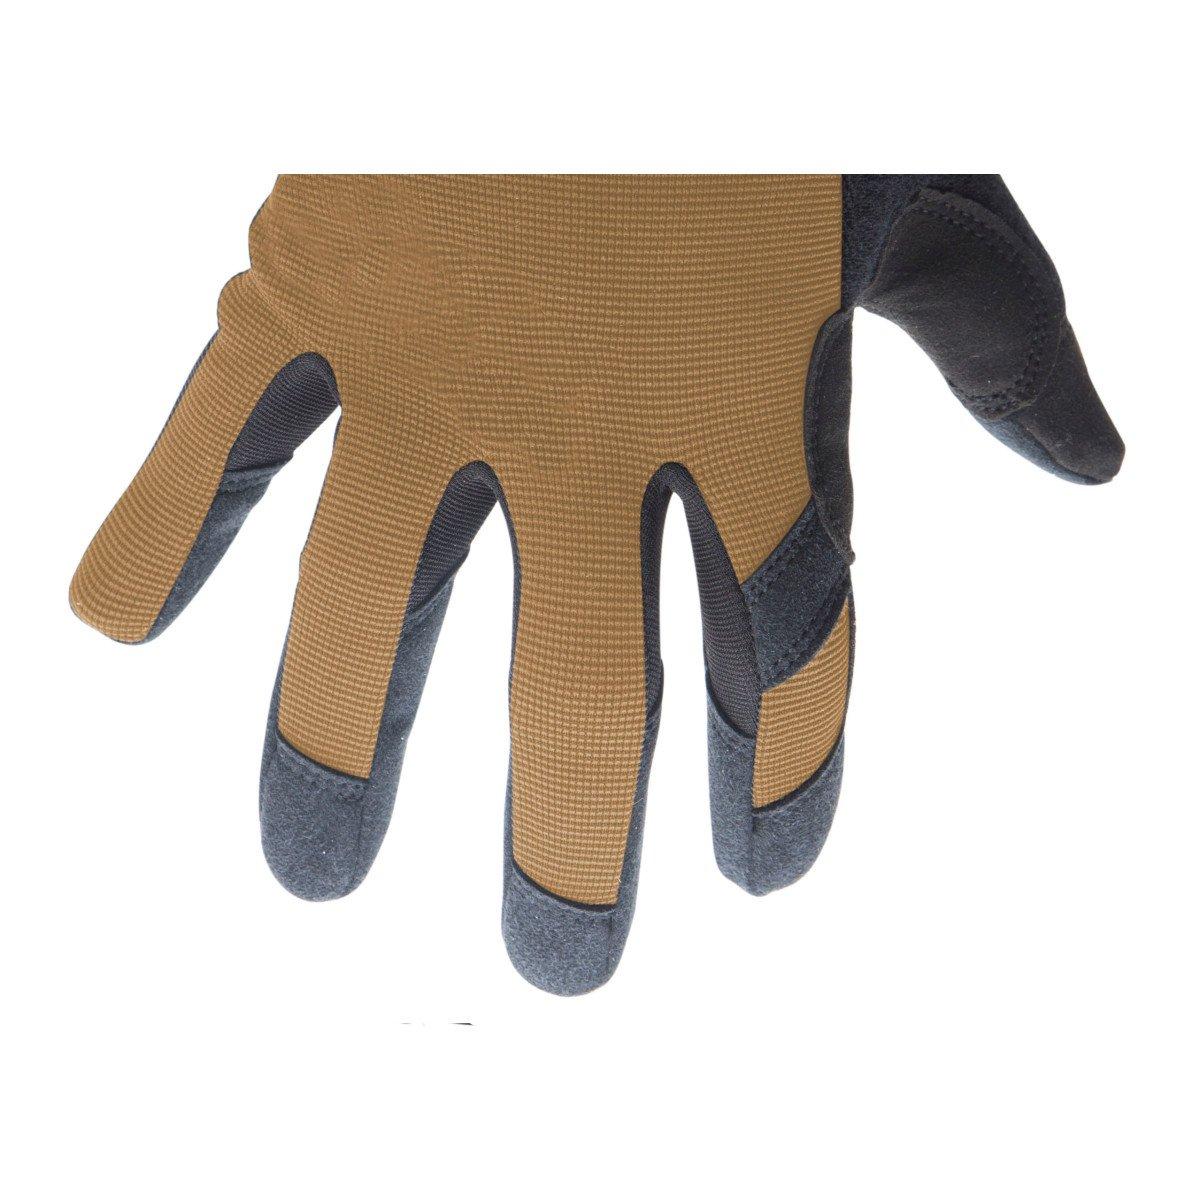 Brown X-Large 212 Performance Gloves MCG-BL70-011 General Utility Mechanic Gloves